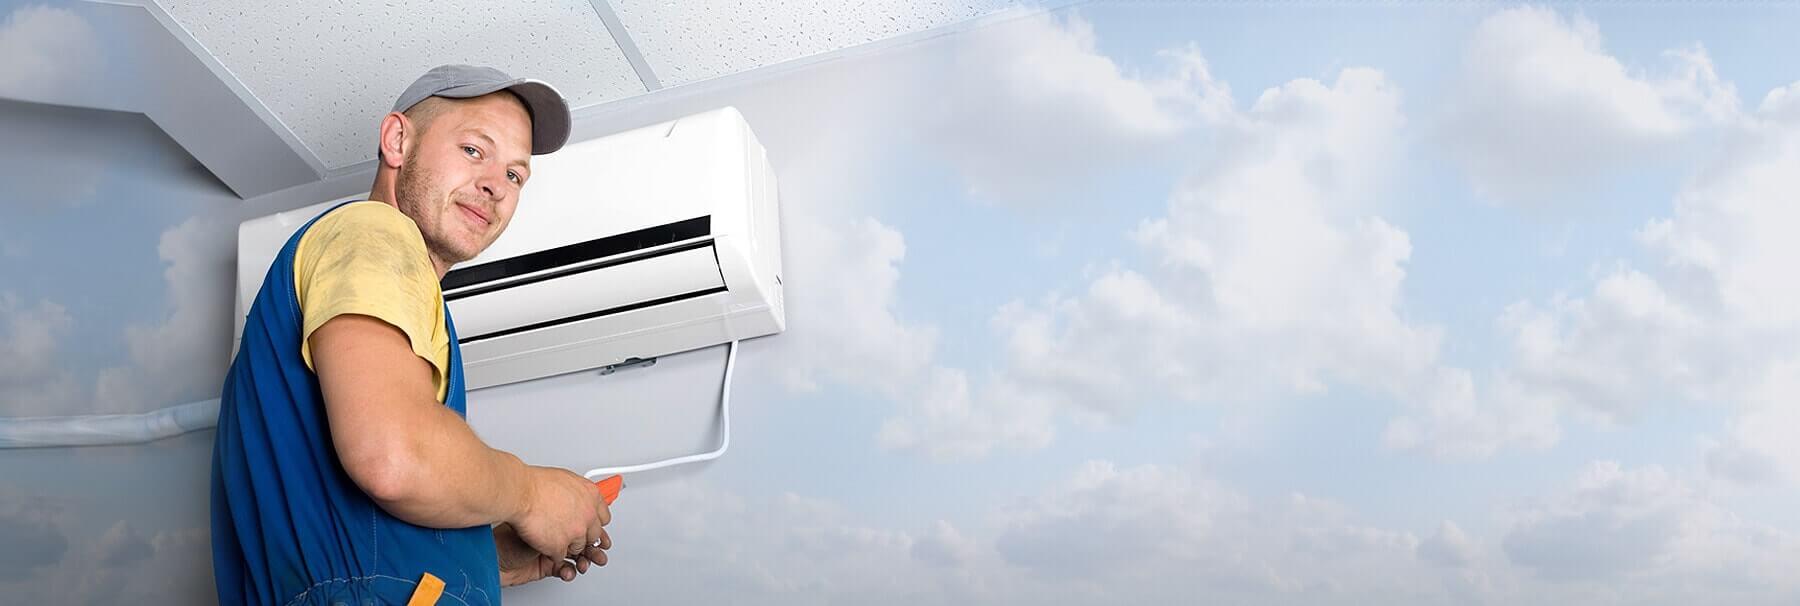 residential air conditioning installation & repair adelaide – true